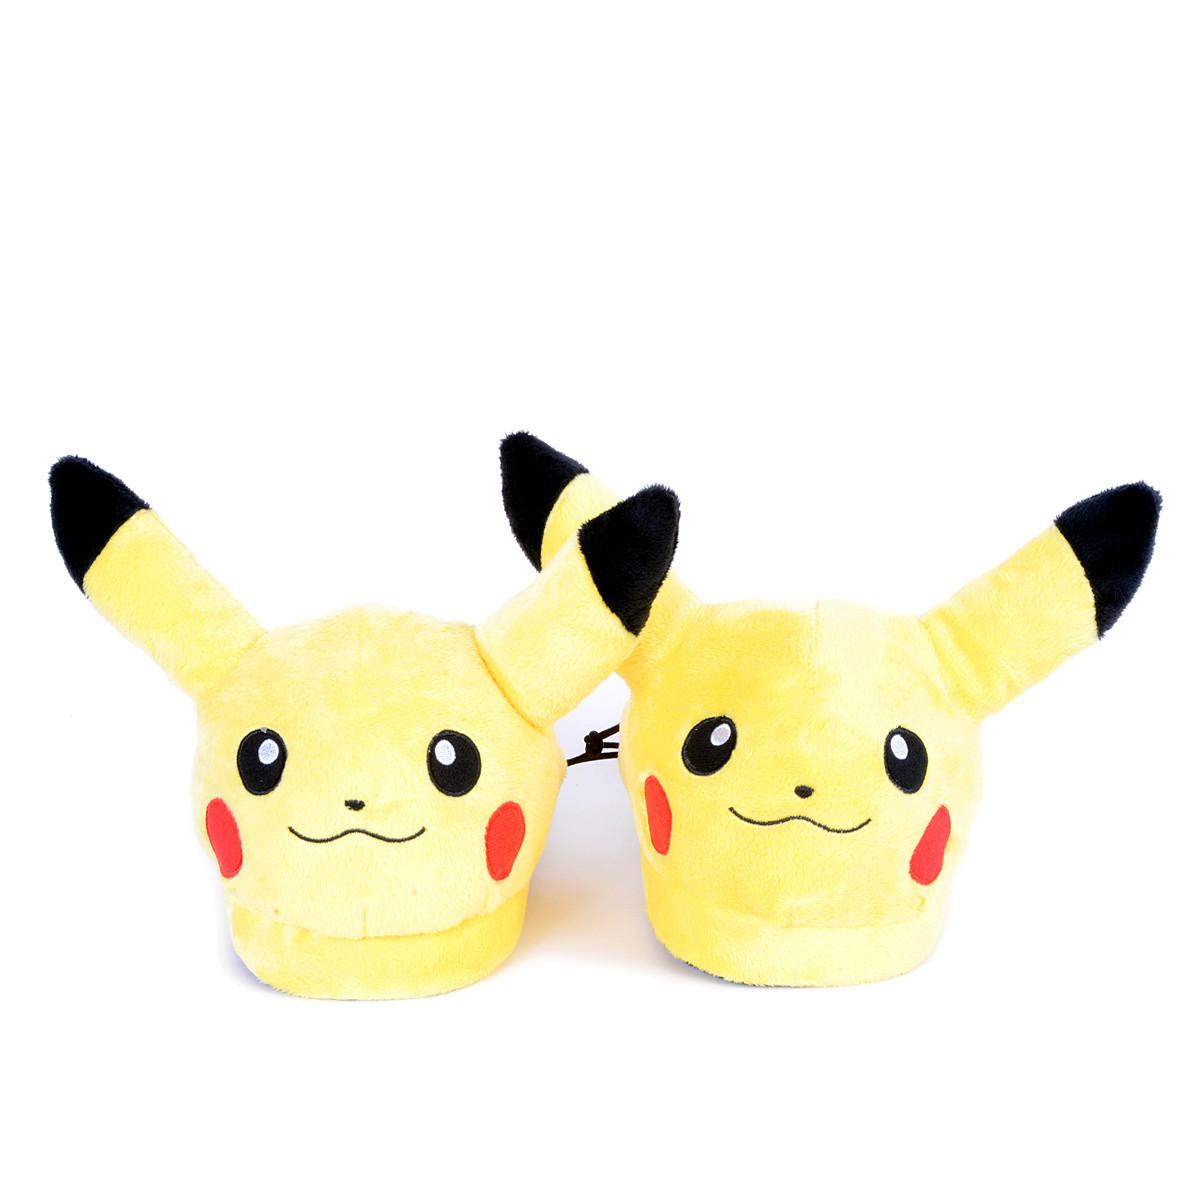 Pikachu Pokemon Plush Slippers